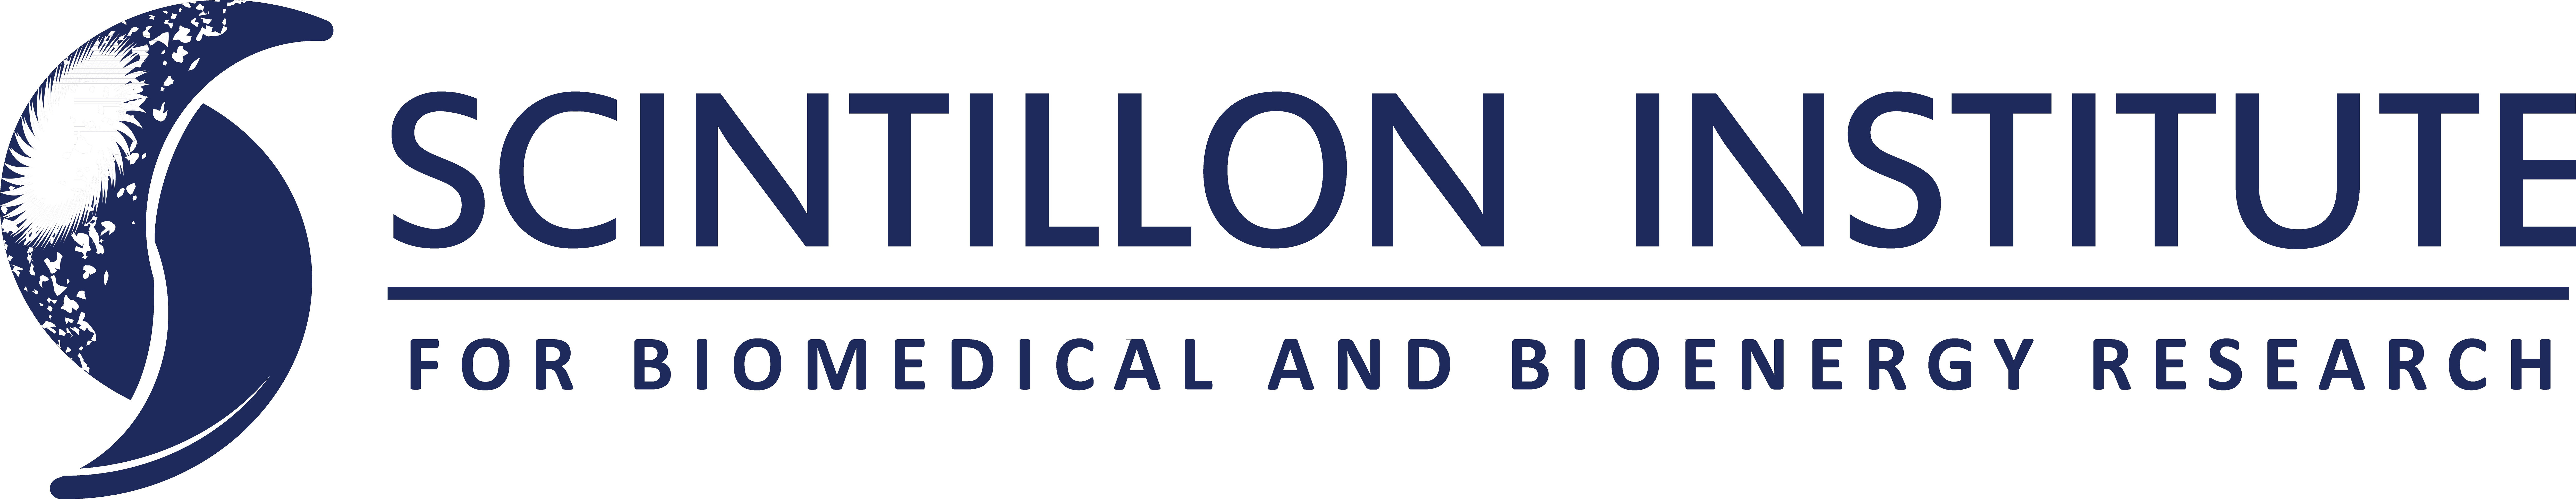 Scintillon_logo_tiny.png